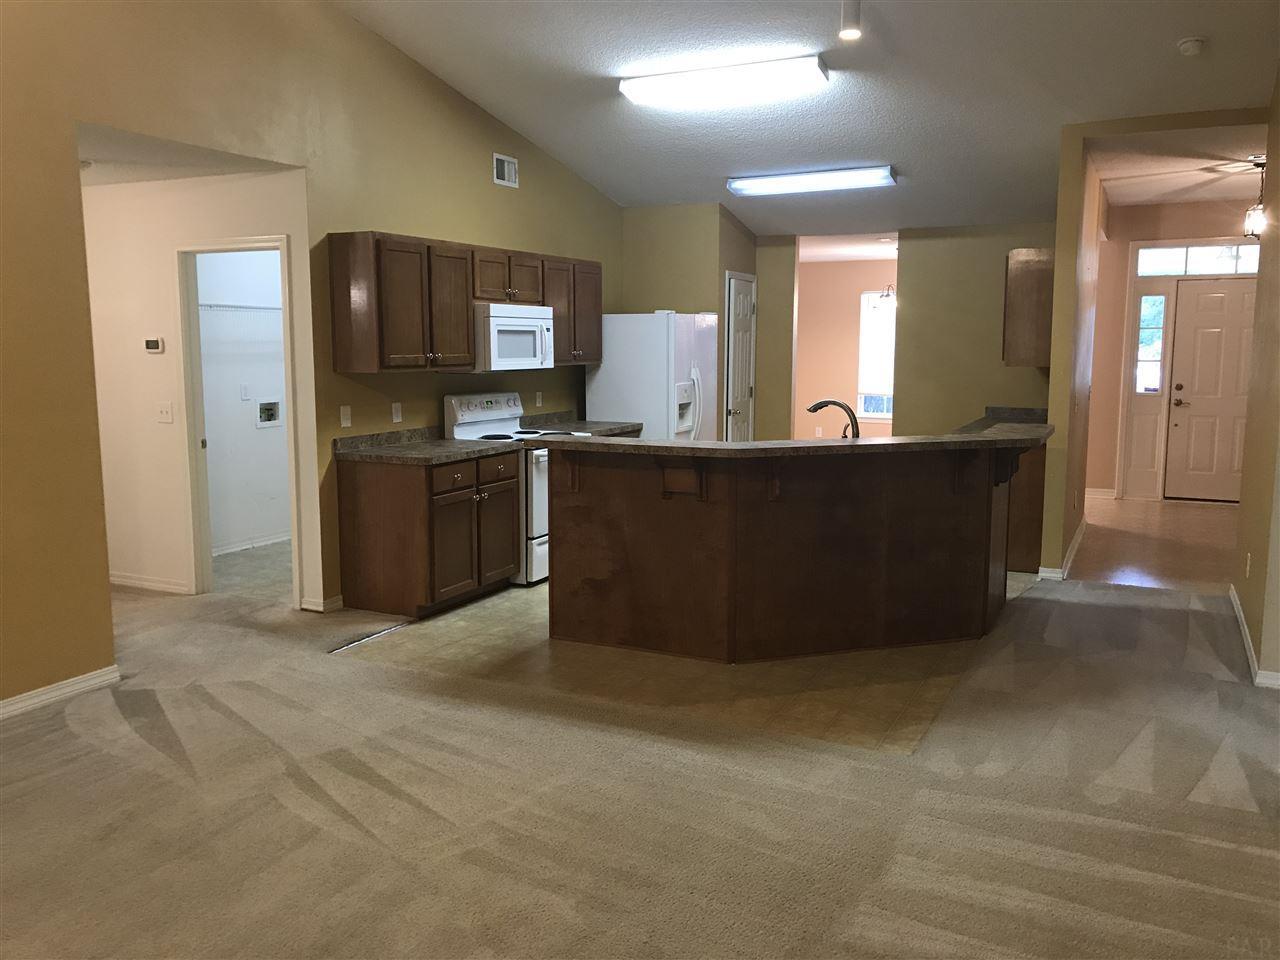 3200 Nikki Ct, Pensacola, FL 32526